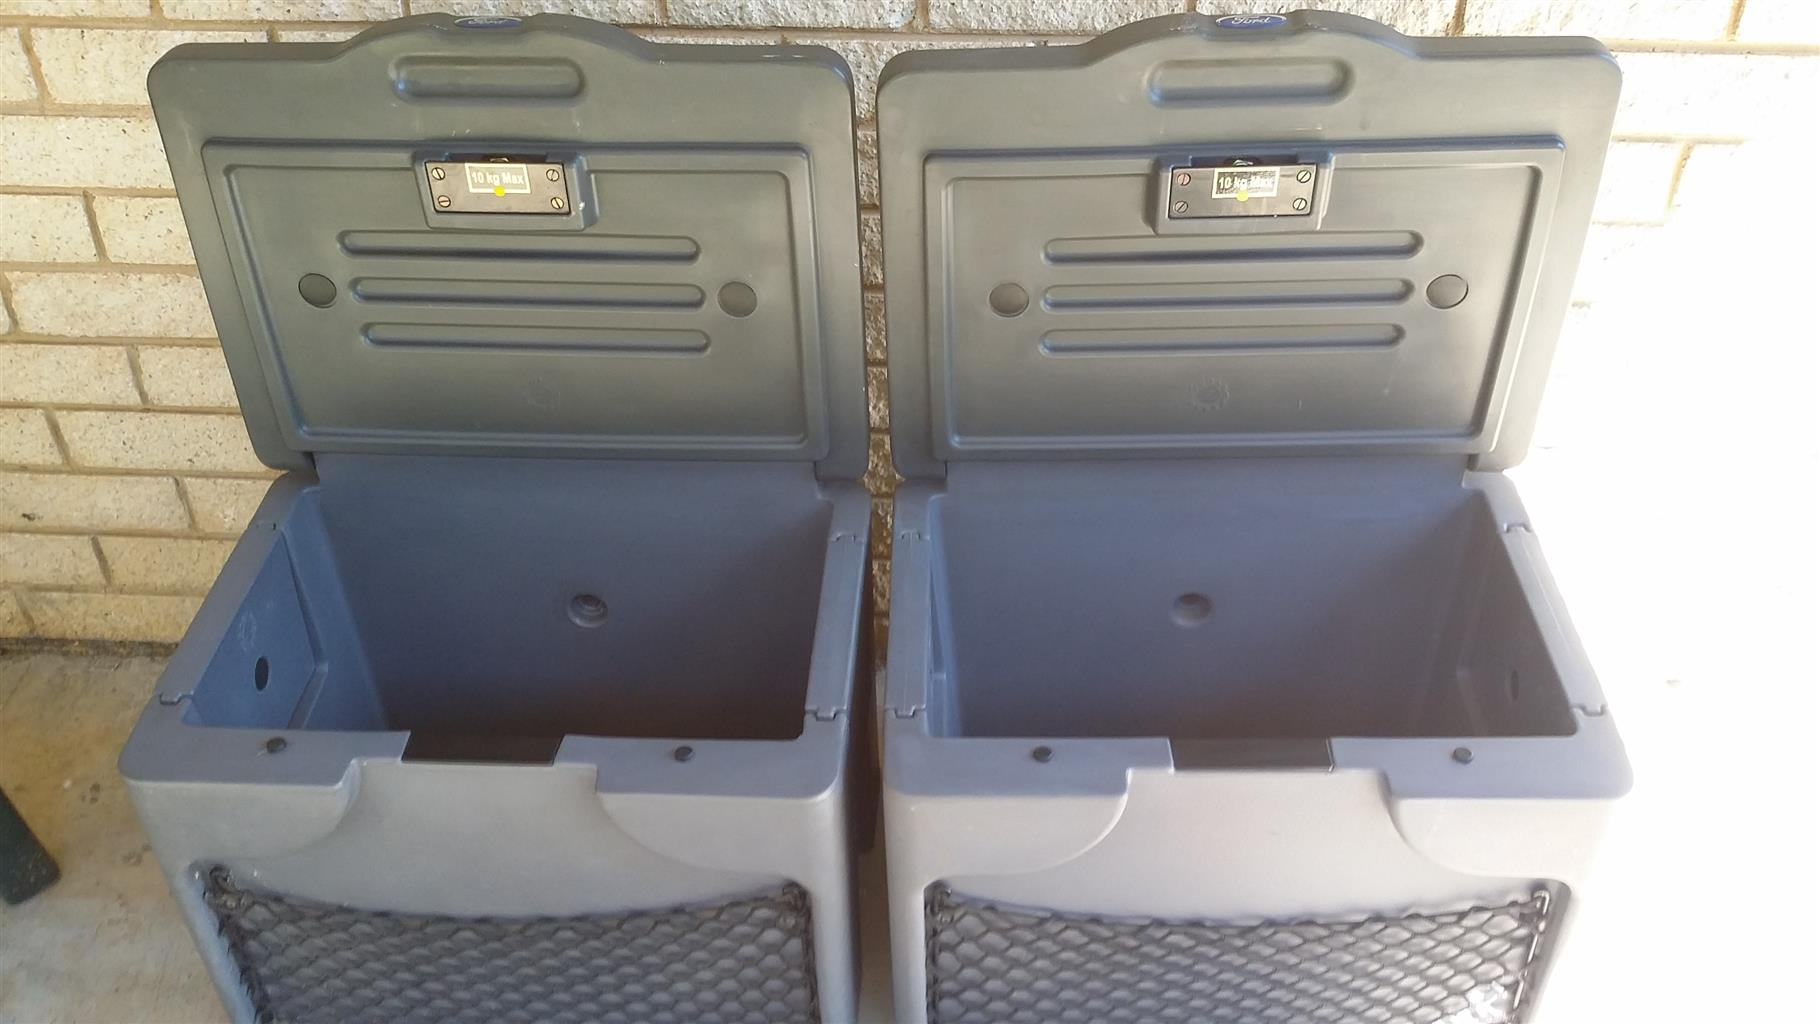 bFord Ranger storage boxes